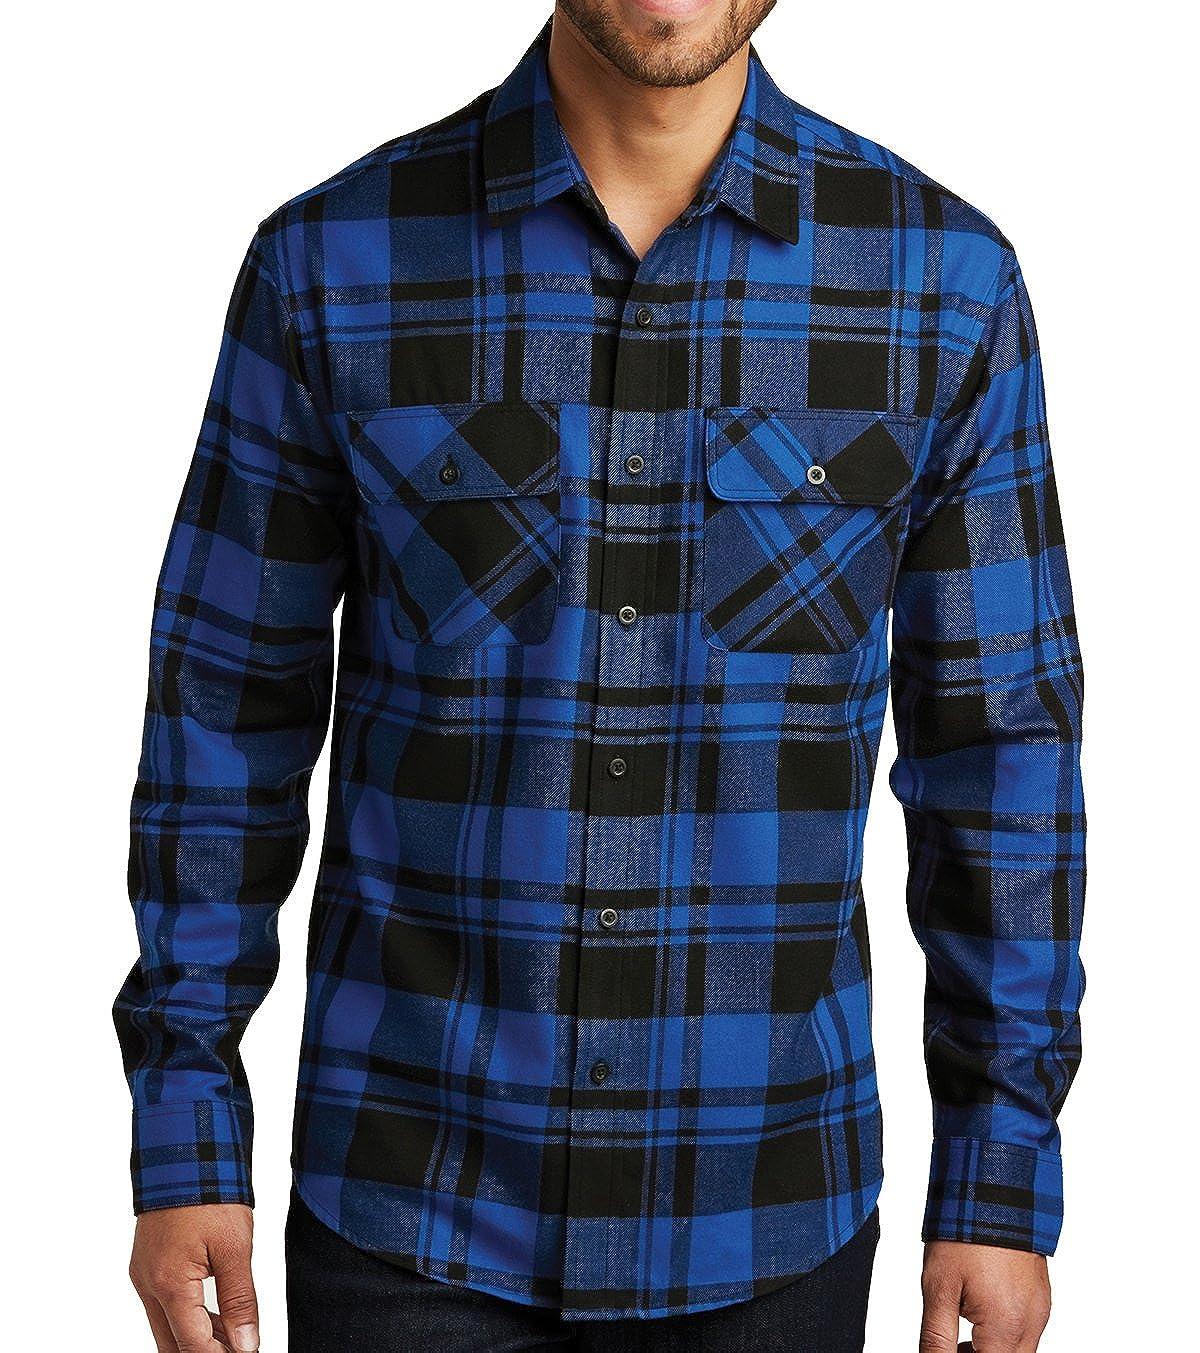 Mafoose Brawny Flannel Plaid Shirt